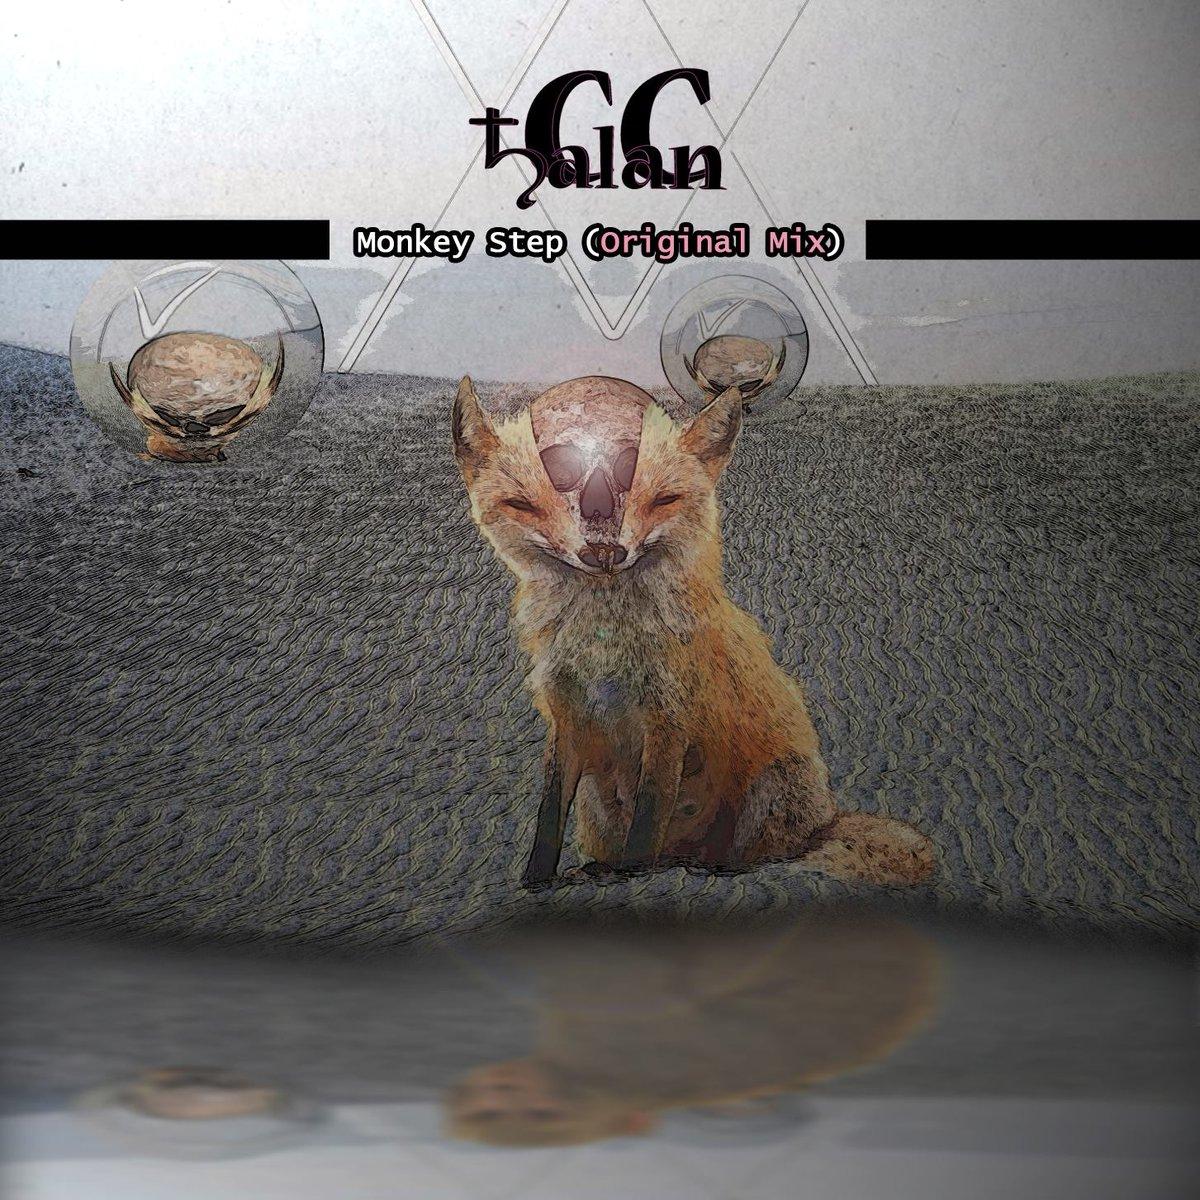 &#39;Humans born 4 dancing&#39; Wait my new release. HALAN C.C. - Monkey Step (Original Mix) 31/01/17 #HalanCc #DjLife #ProgressiveHouse #HertzMusic<br>http://pic.twitter.com/VnTrx36qRQ